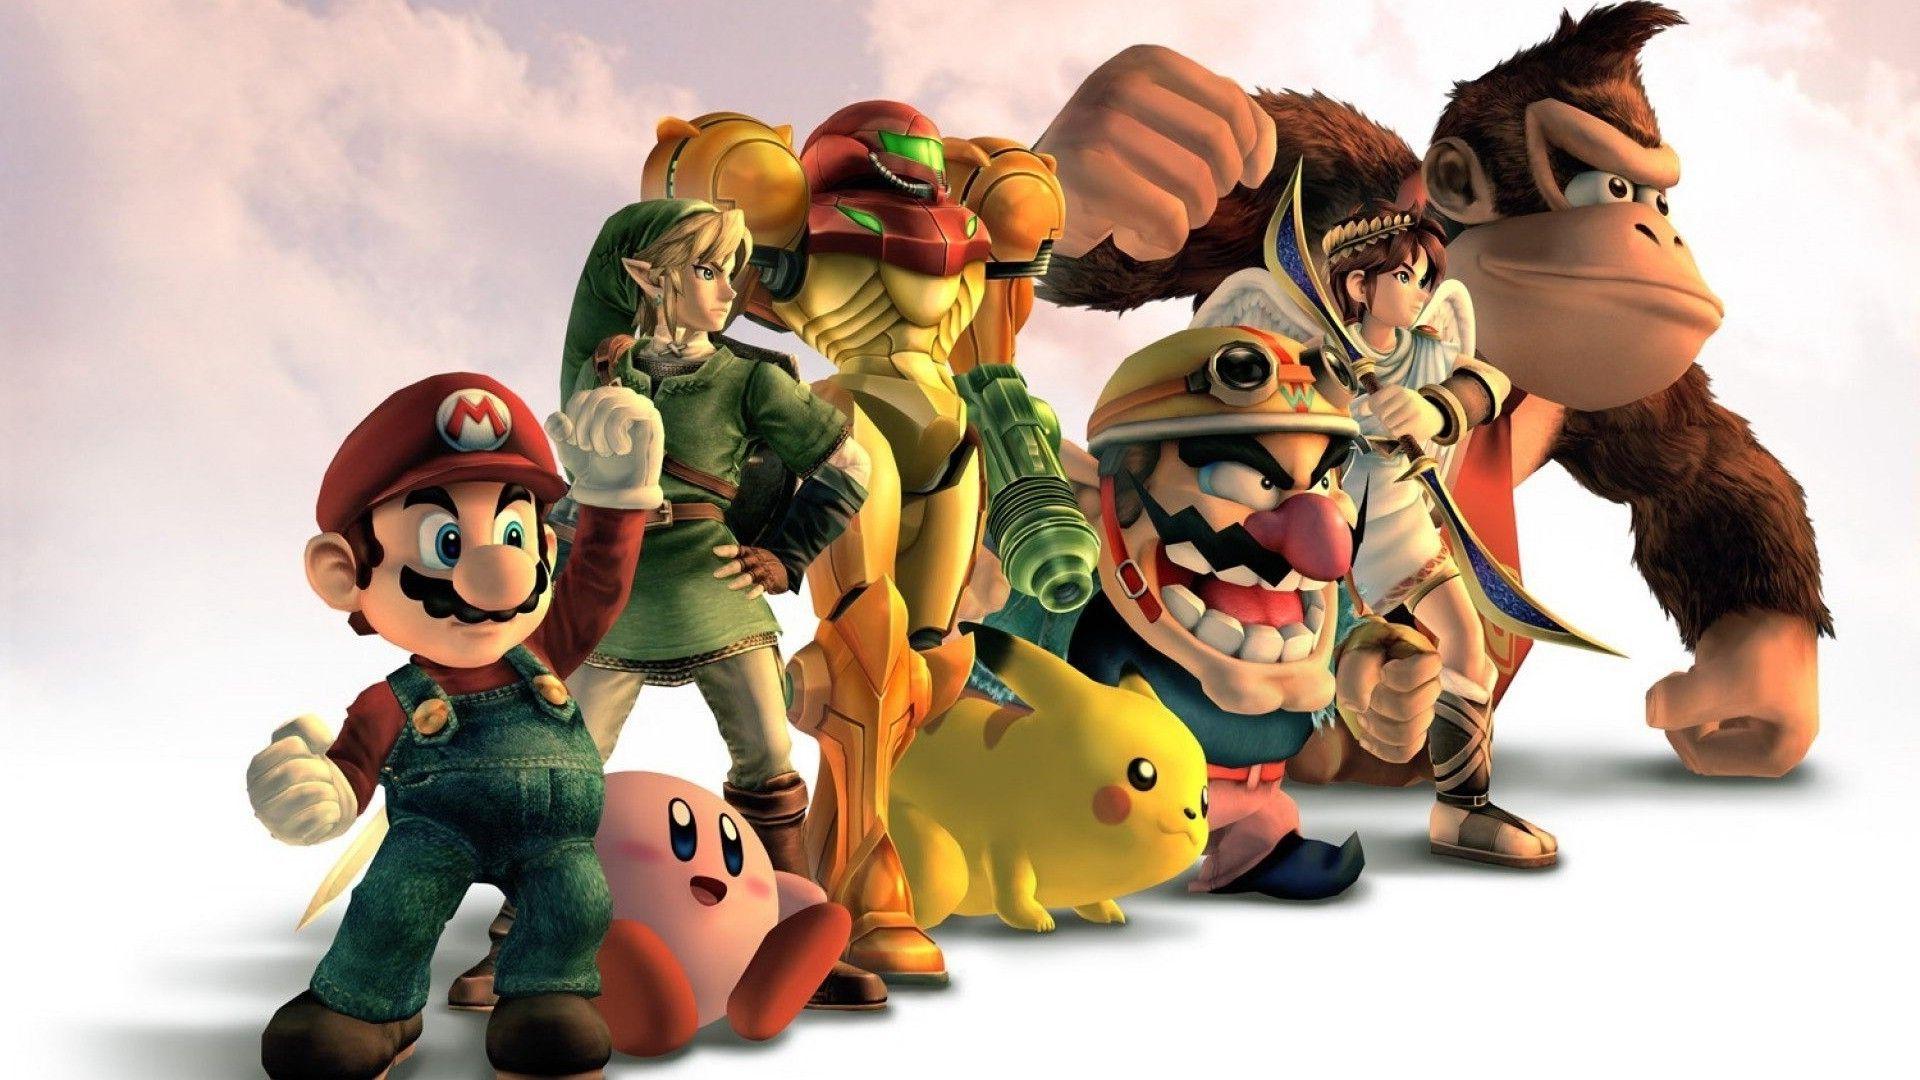 Donkey Kong Country Returns Wallpaper 1280 1024 Donkey Kong Wallpapers Adorable Wallpapers Smash Bros Super Smash Bros Super Smash Bros Brawl